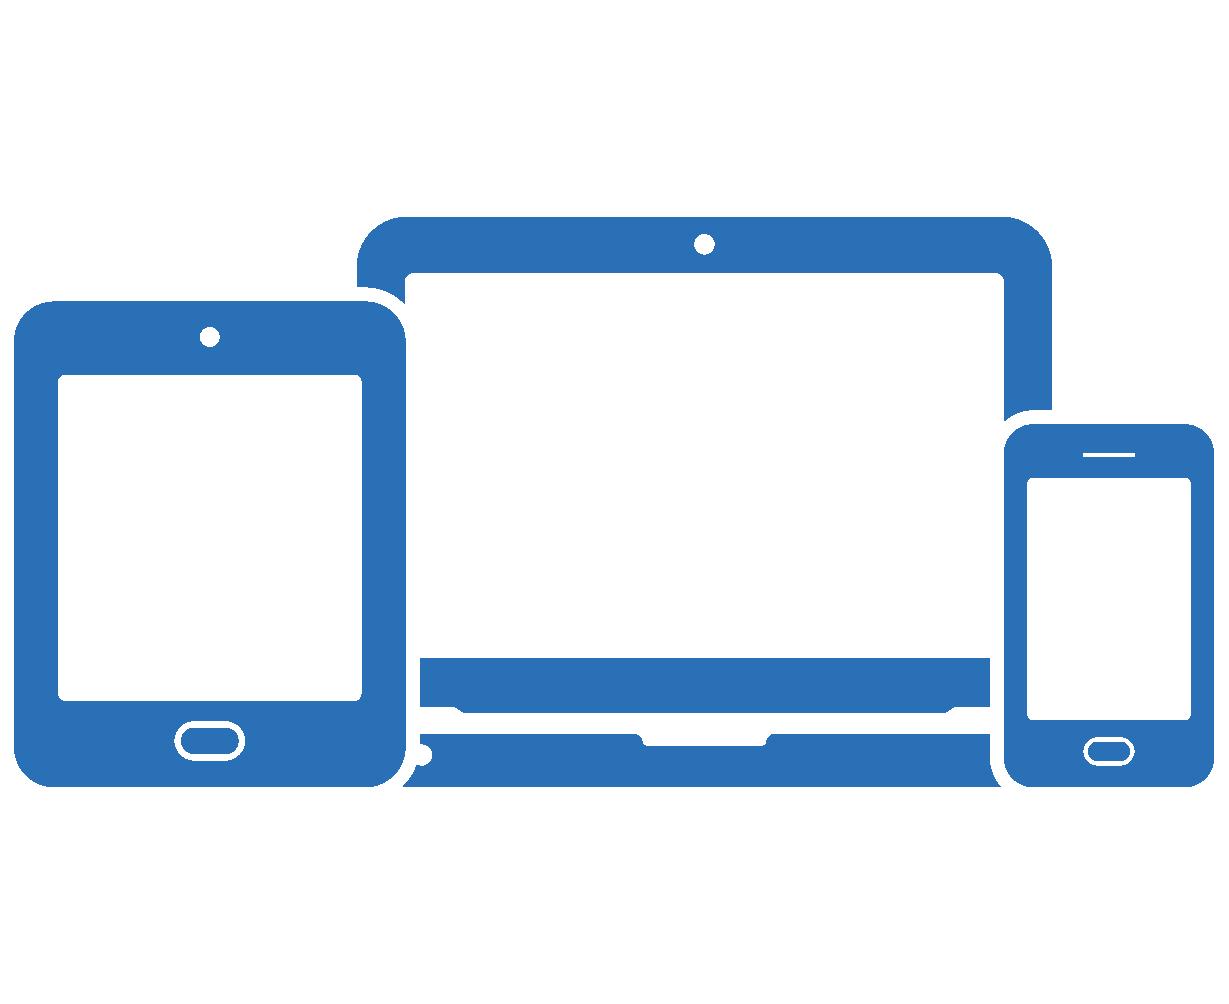 Multi-screen access